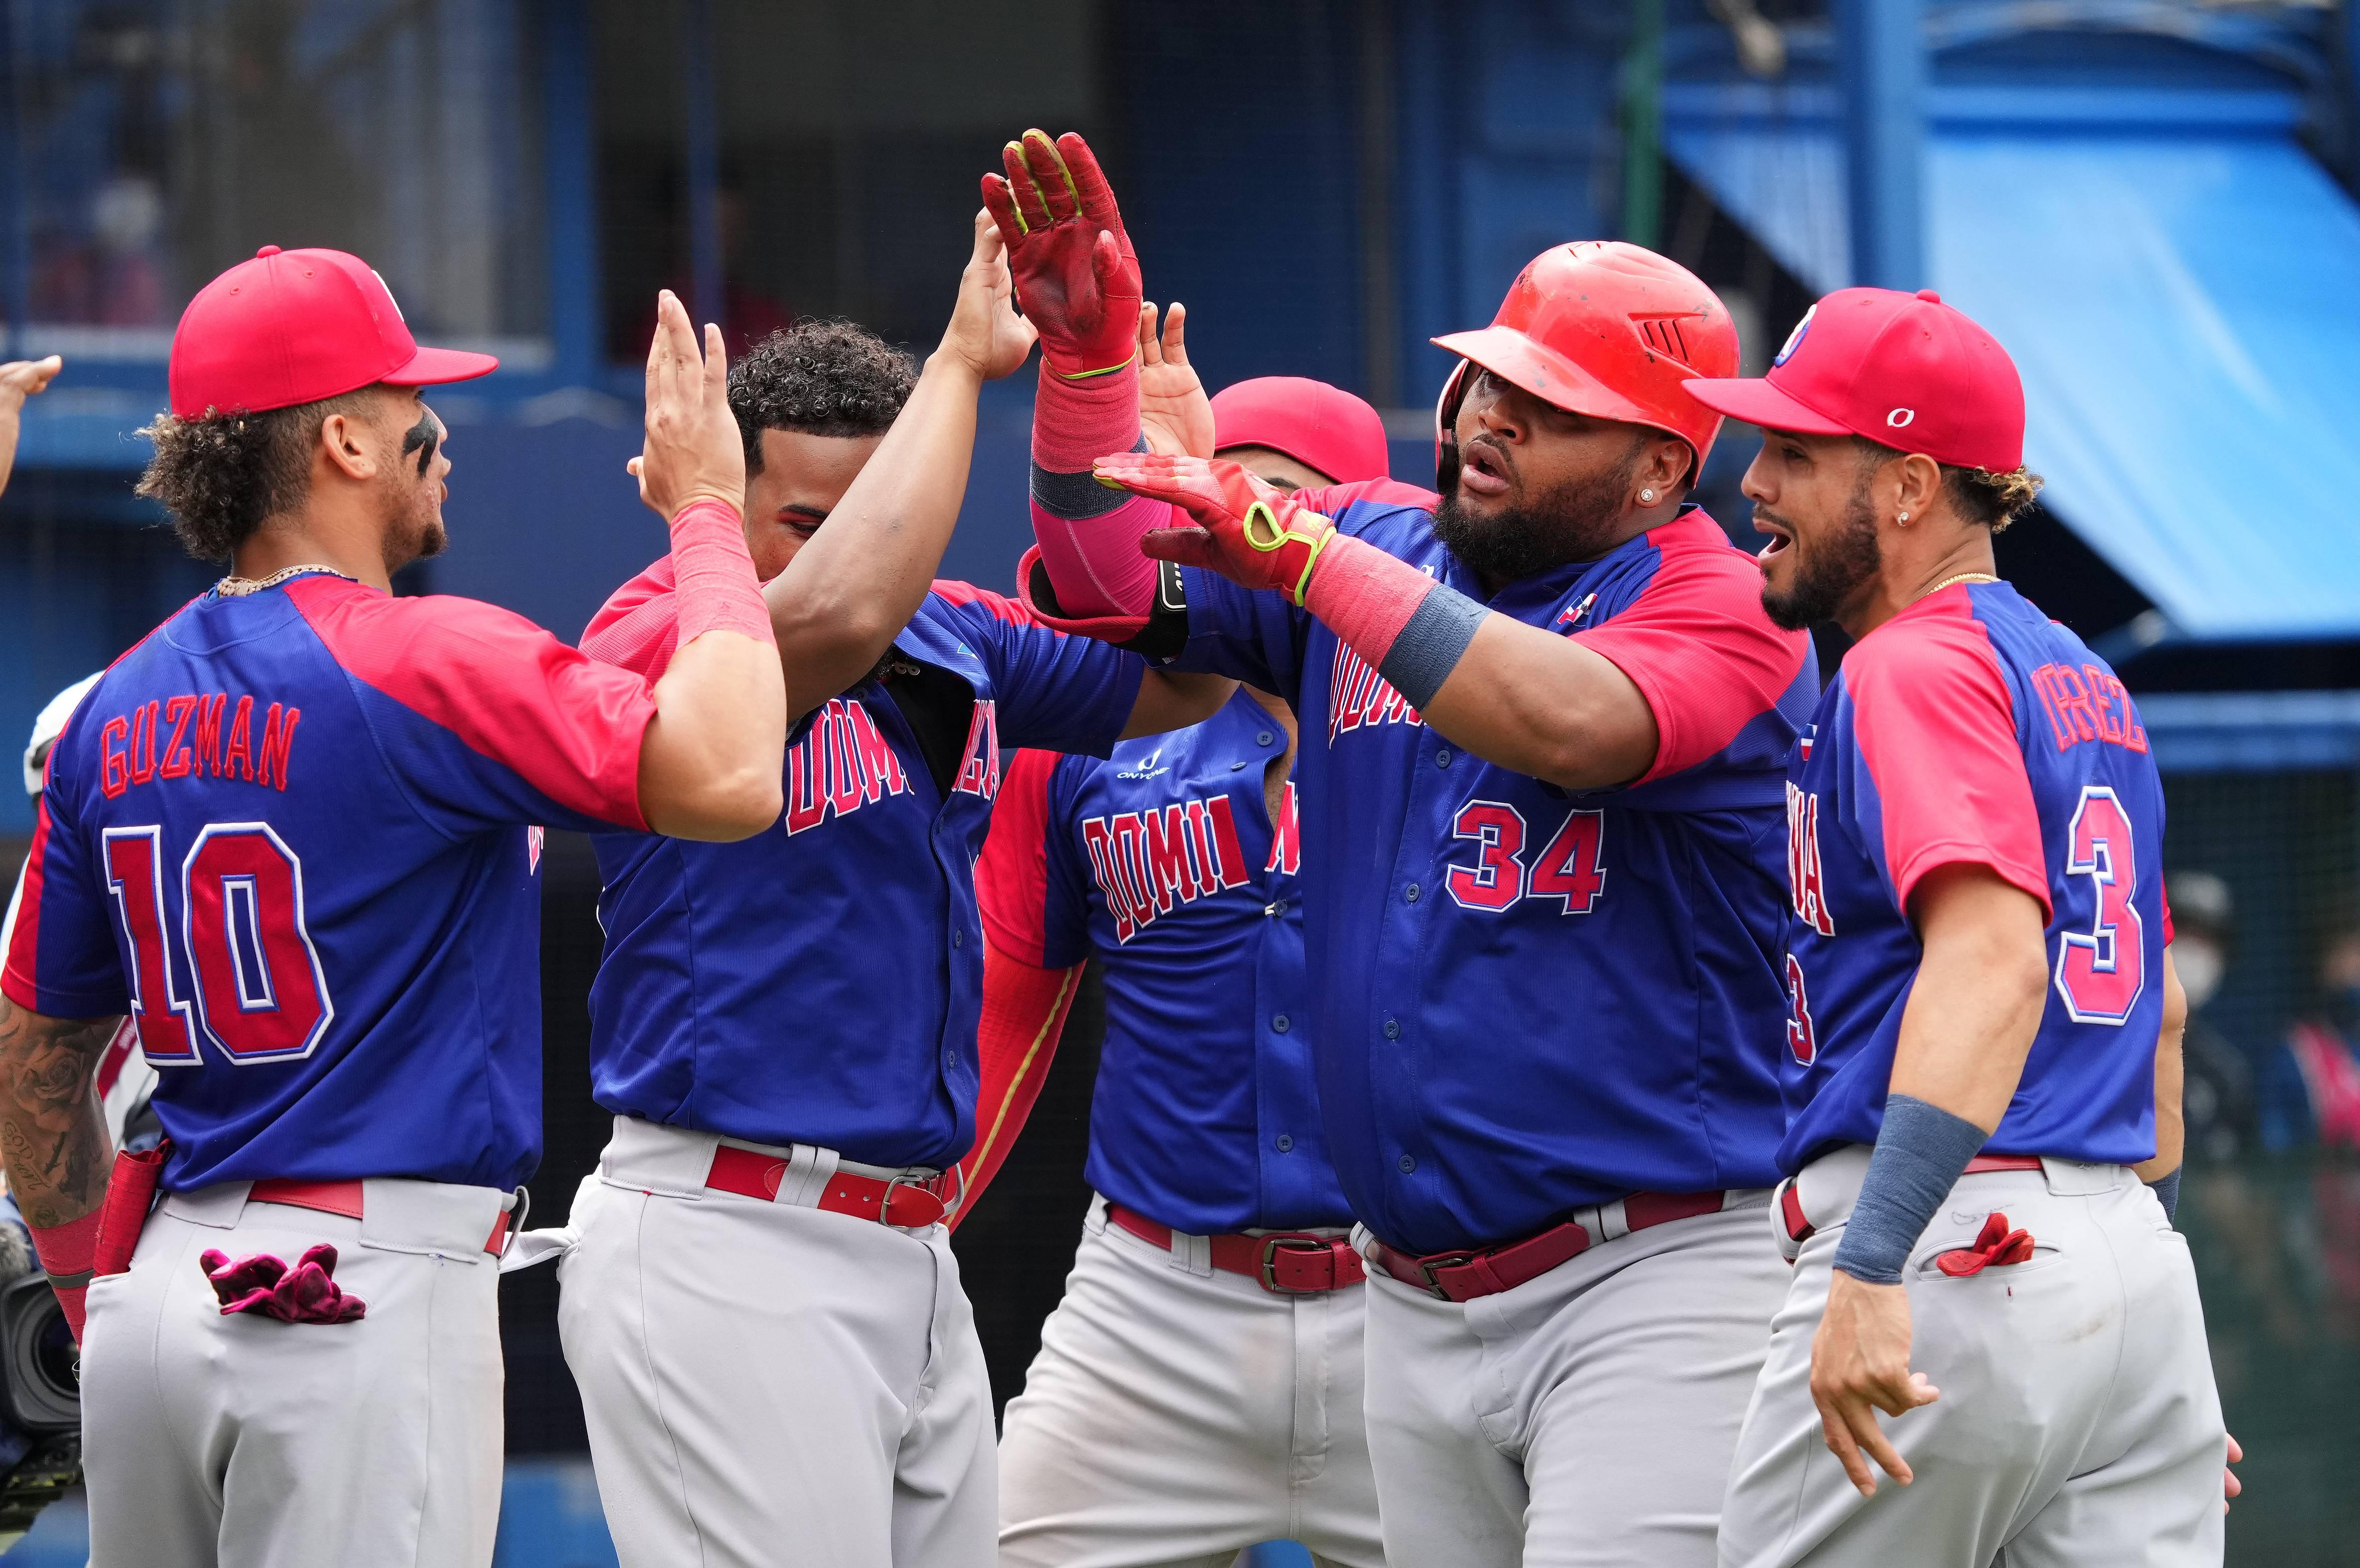 ¡Bronce para el béisbol de la República Dominicana!